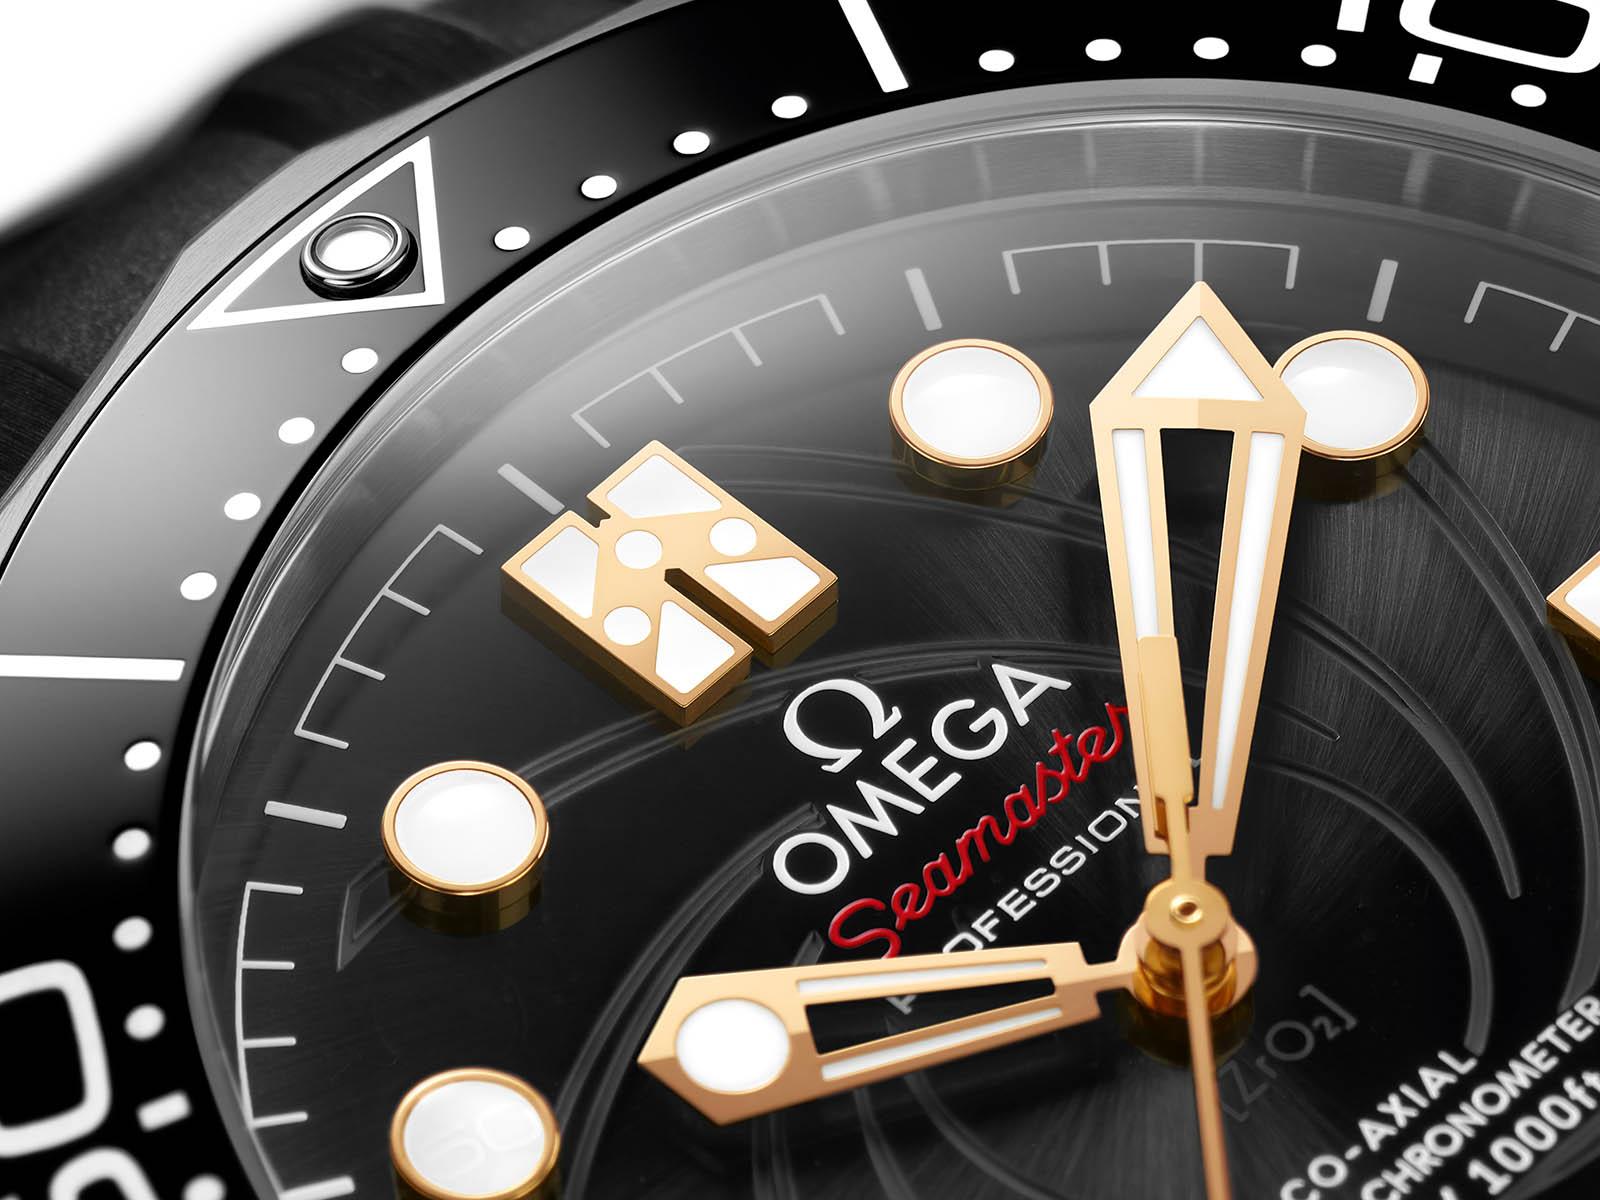 210-22-42-20-01-004-omega-seamaster-300m-diver-007-6-.jpg